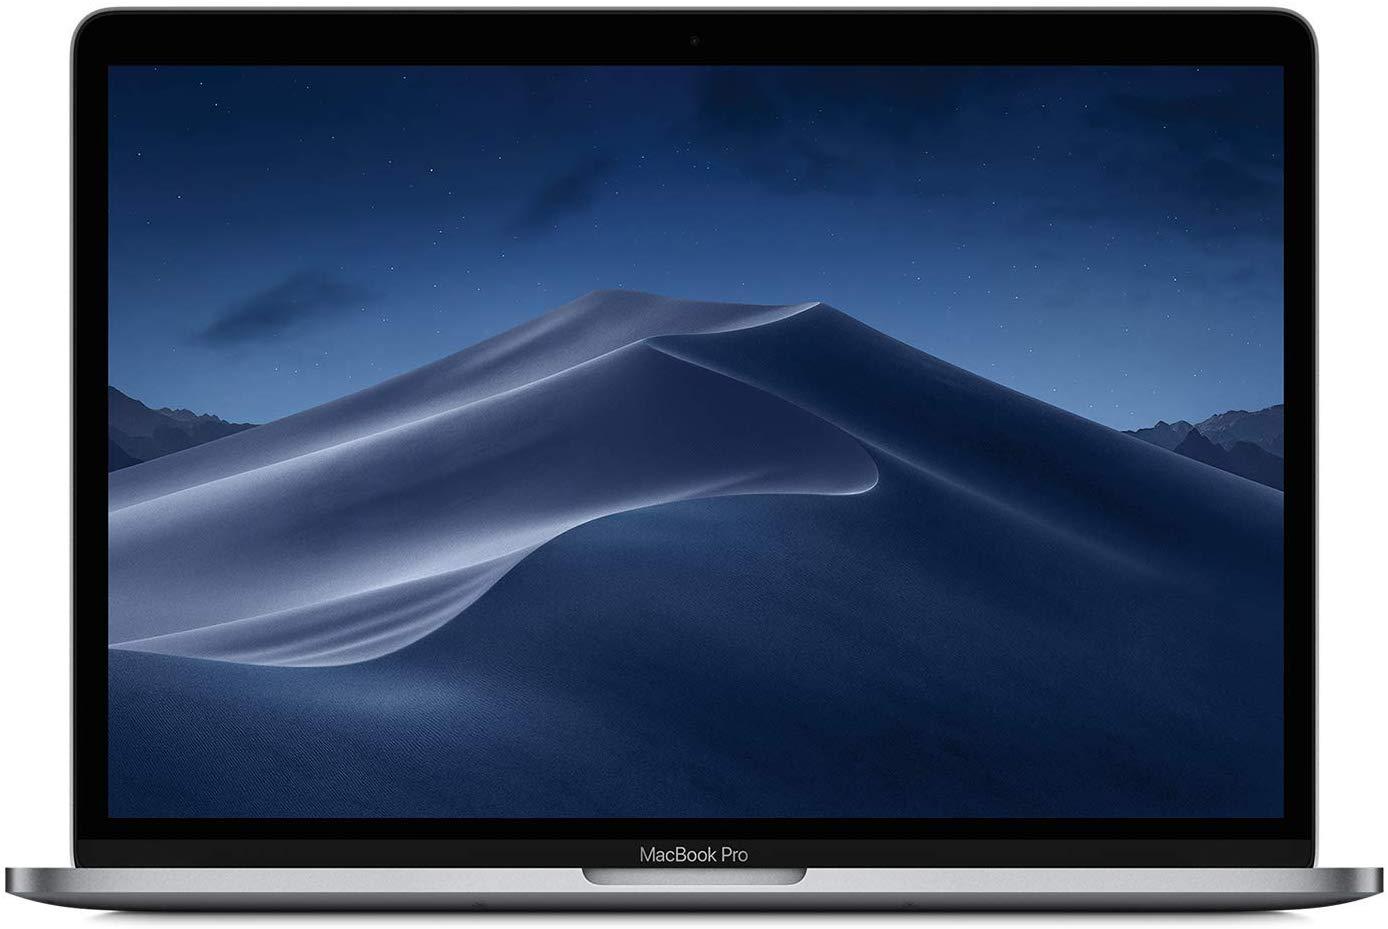 Apple MacBook Pro (13-inch Retina, Touch Bar, 2.3GHz Quad-Core Intel Core i5, 8GB   RAM, 256GB SSD) - Space Grey - £1,172.91 @ Amazon